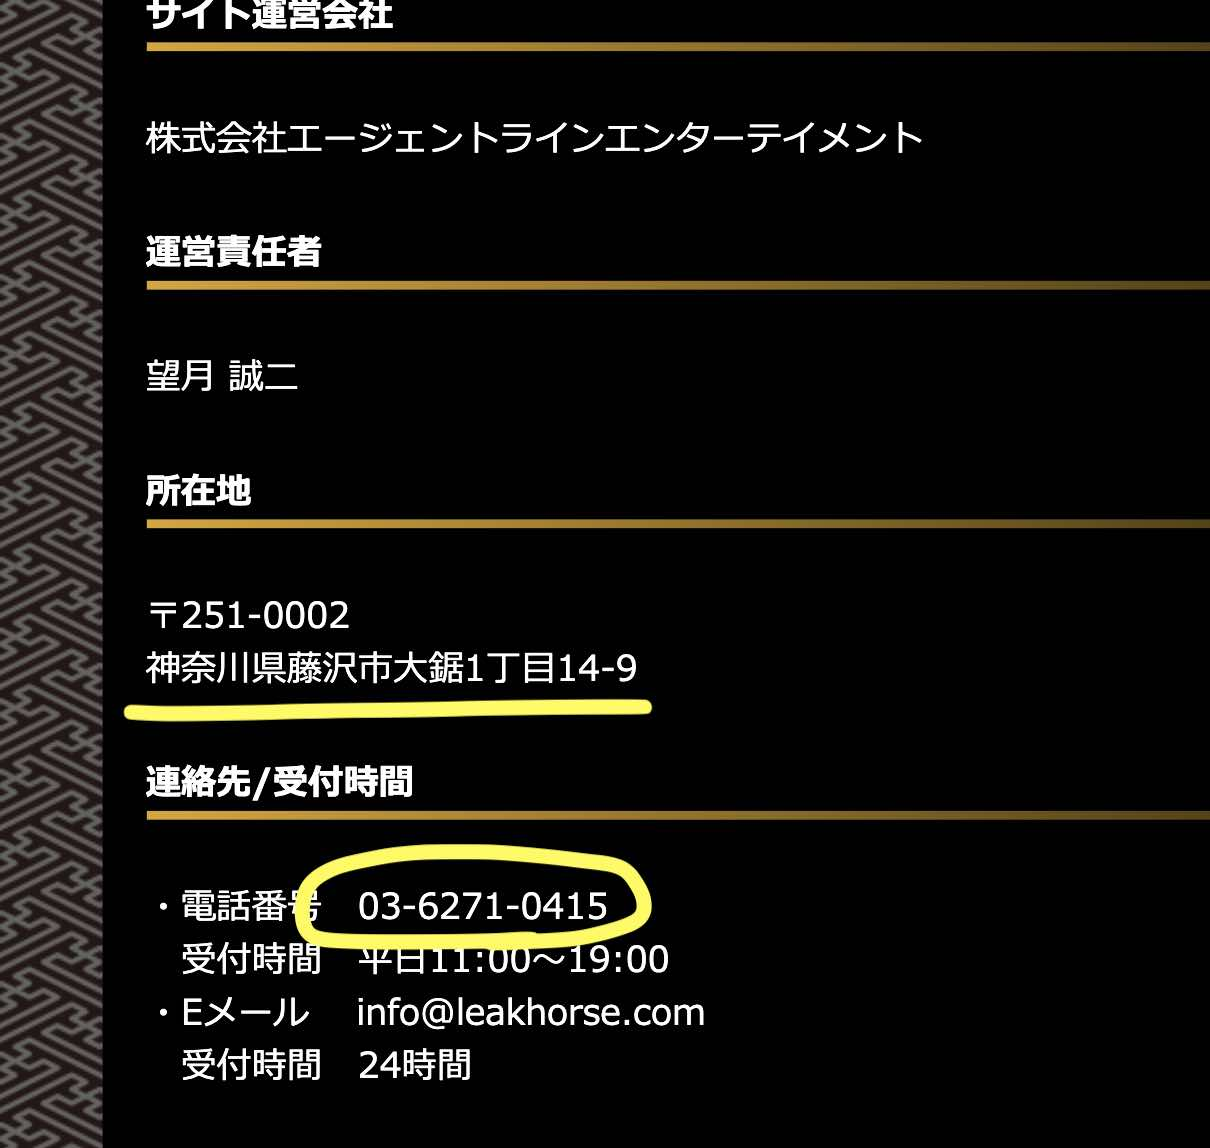 MUTEKIという競馬予想サイトは神奈川県なのに「03」の電話番号